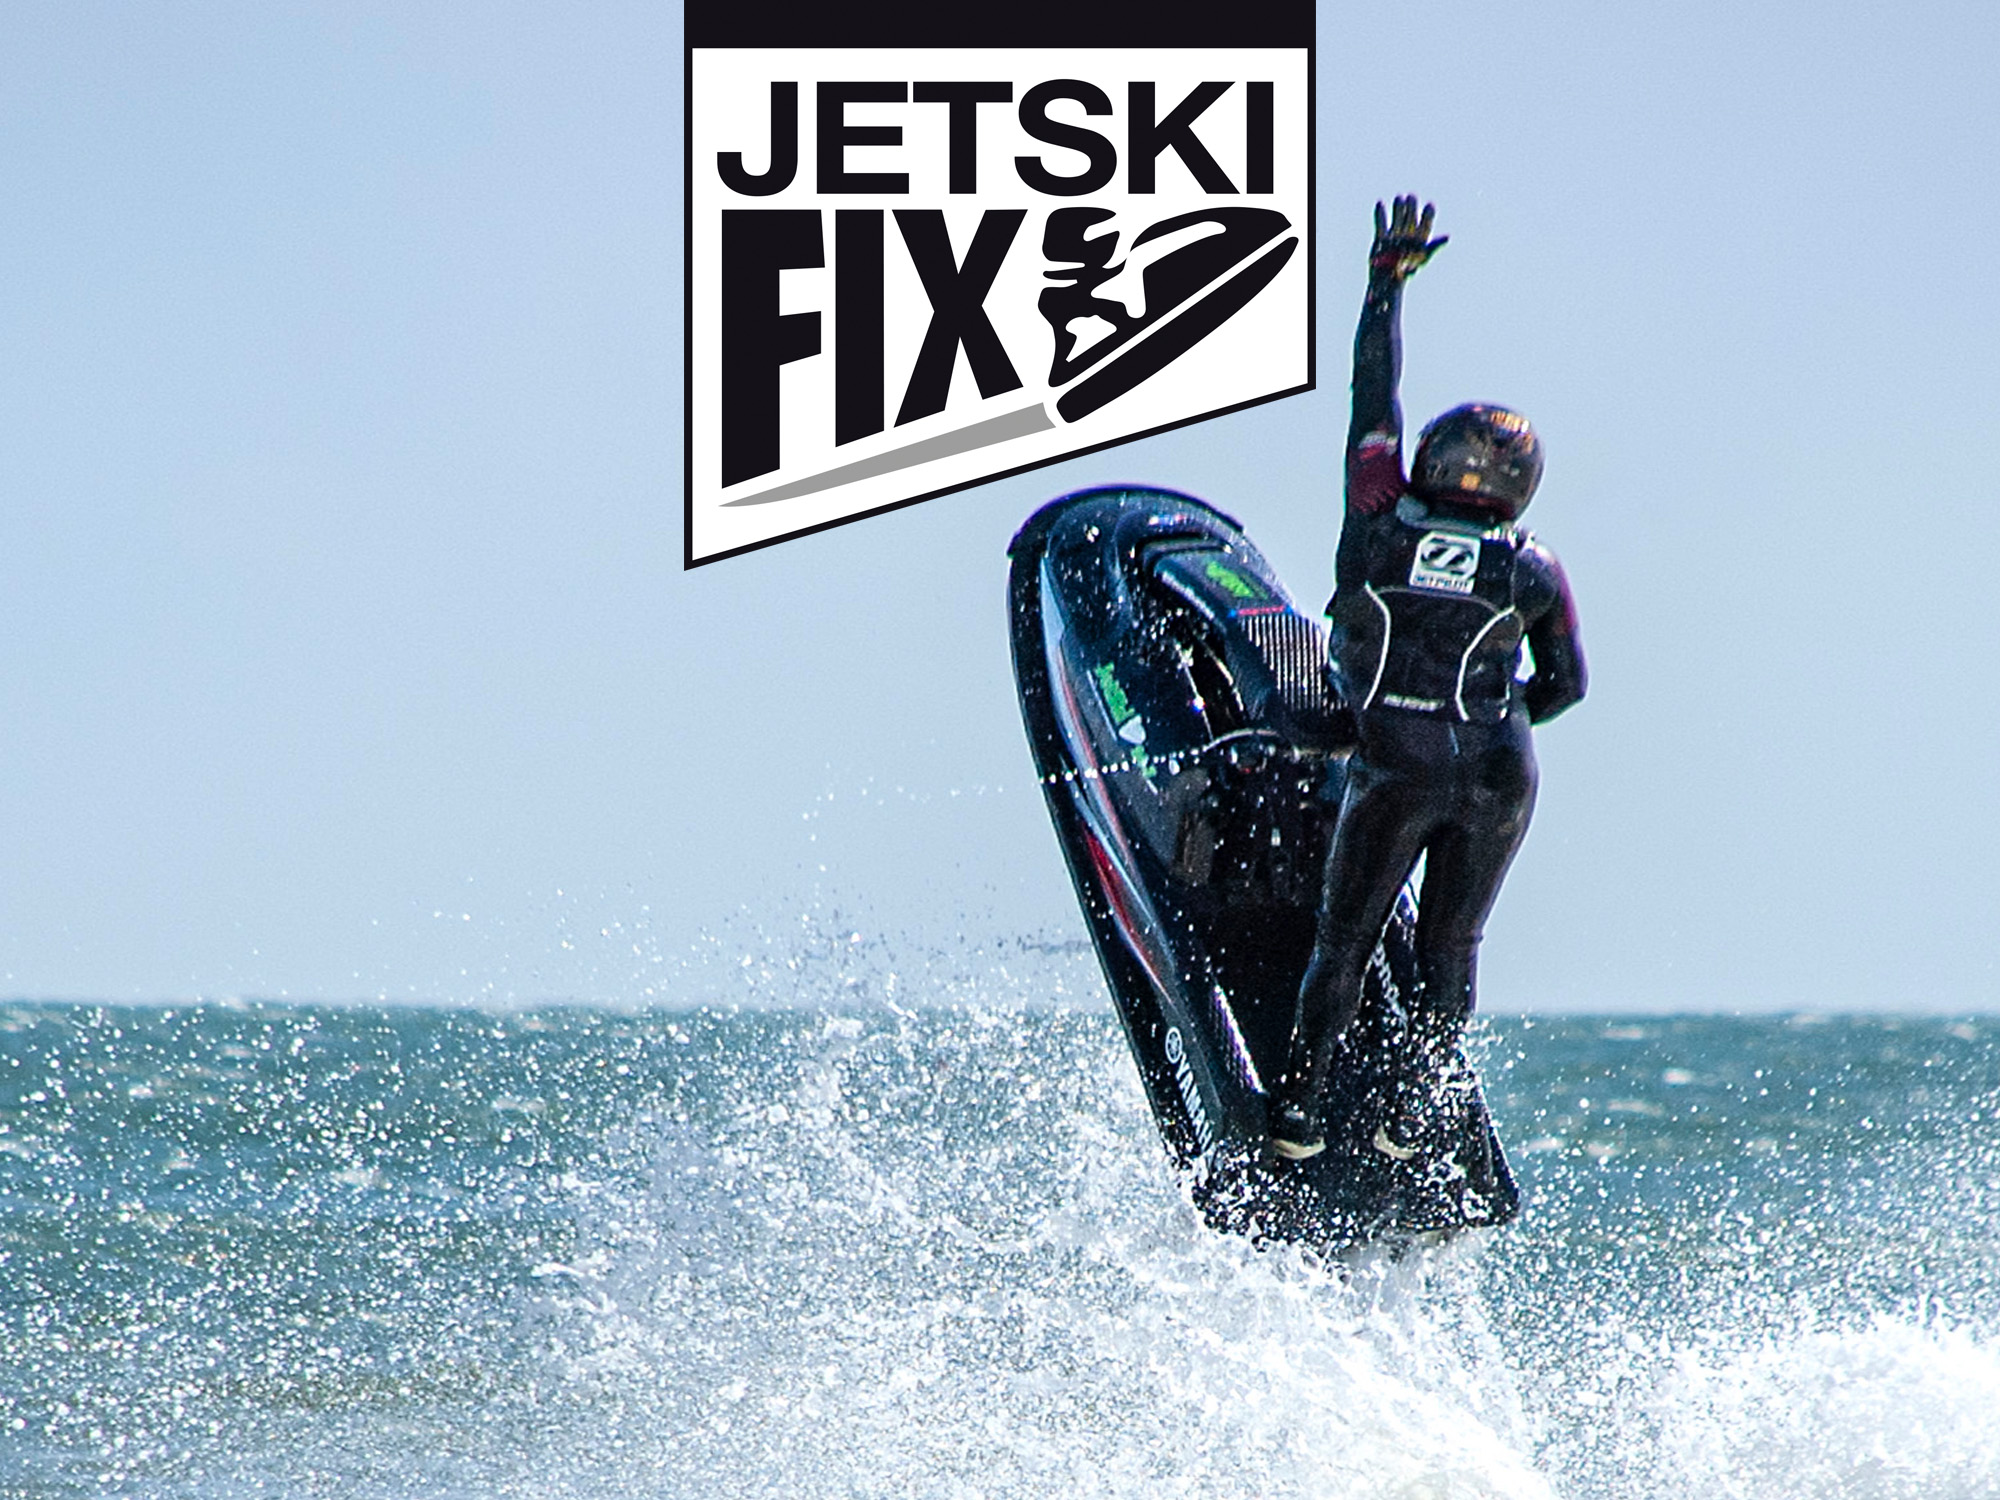 jetskifix one handed